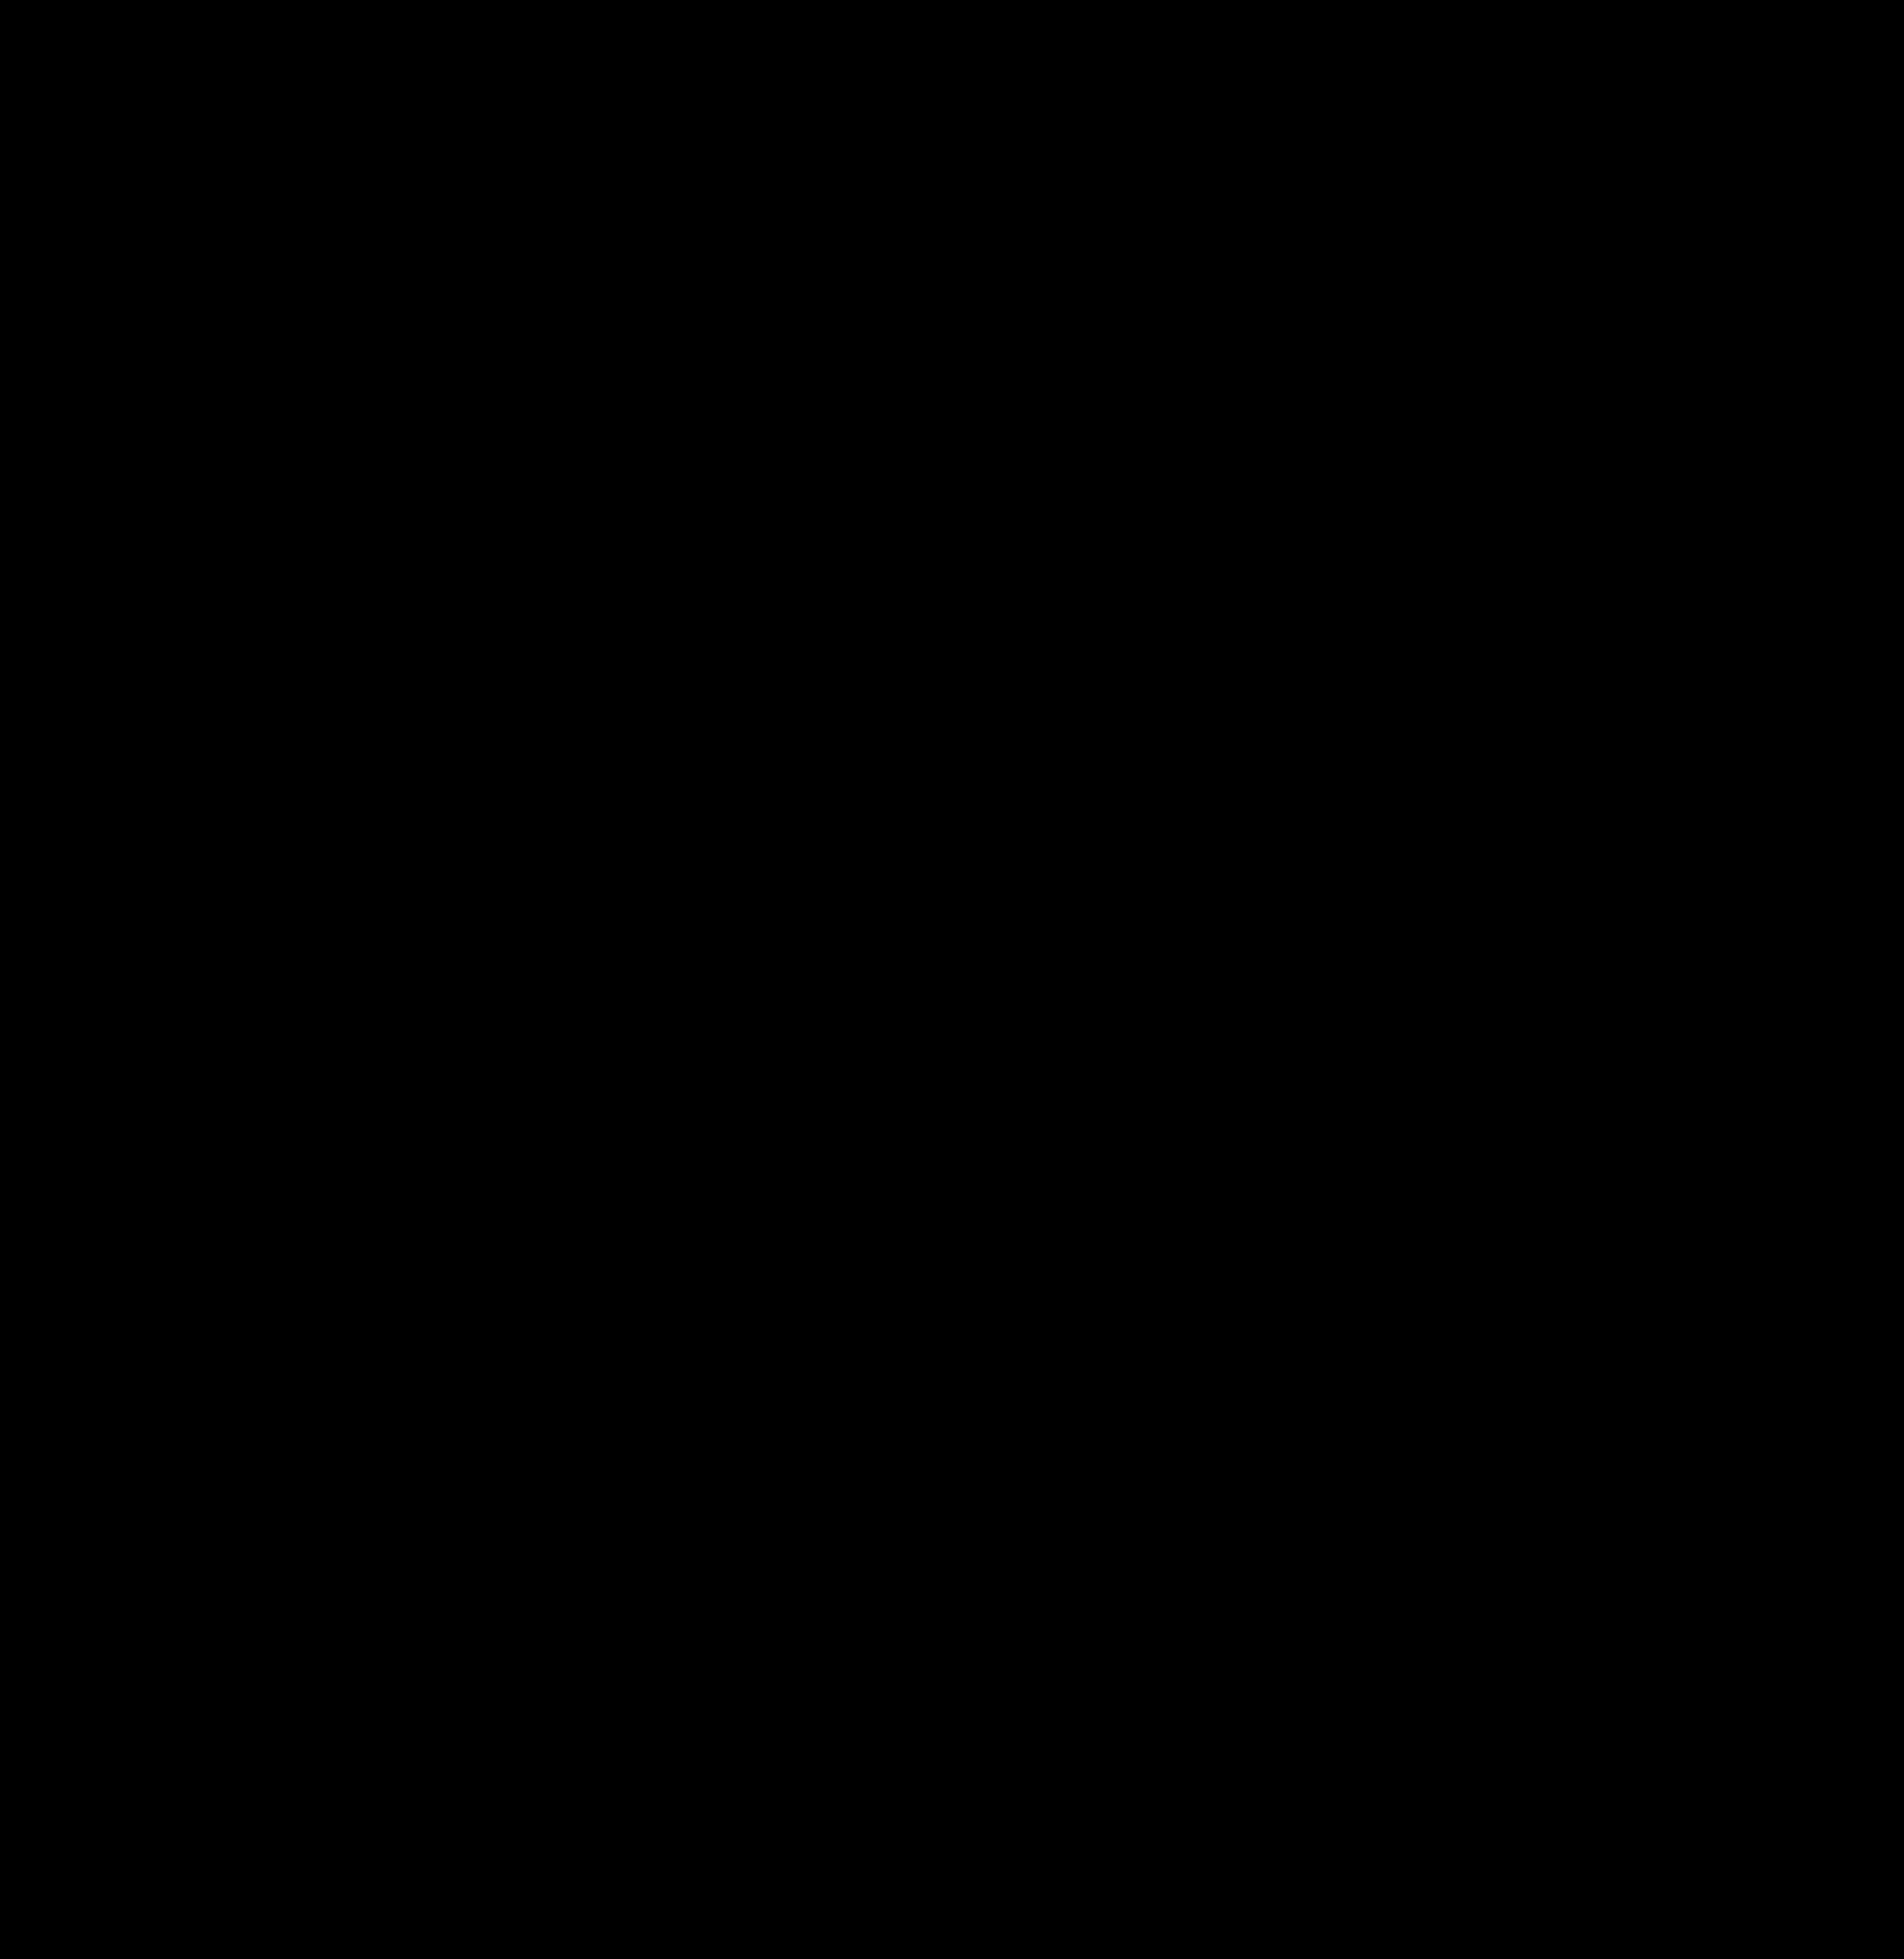 2096x2156 Clipart